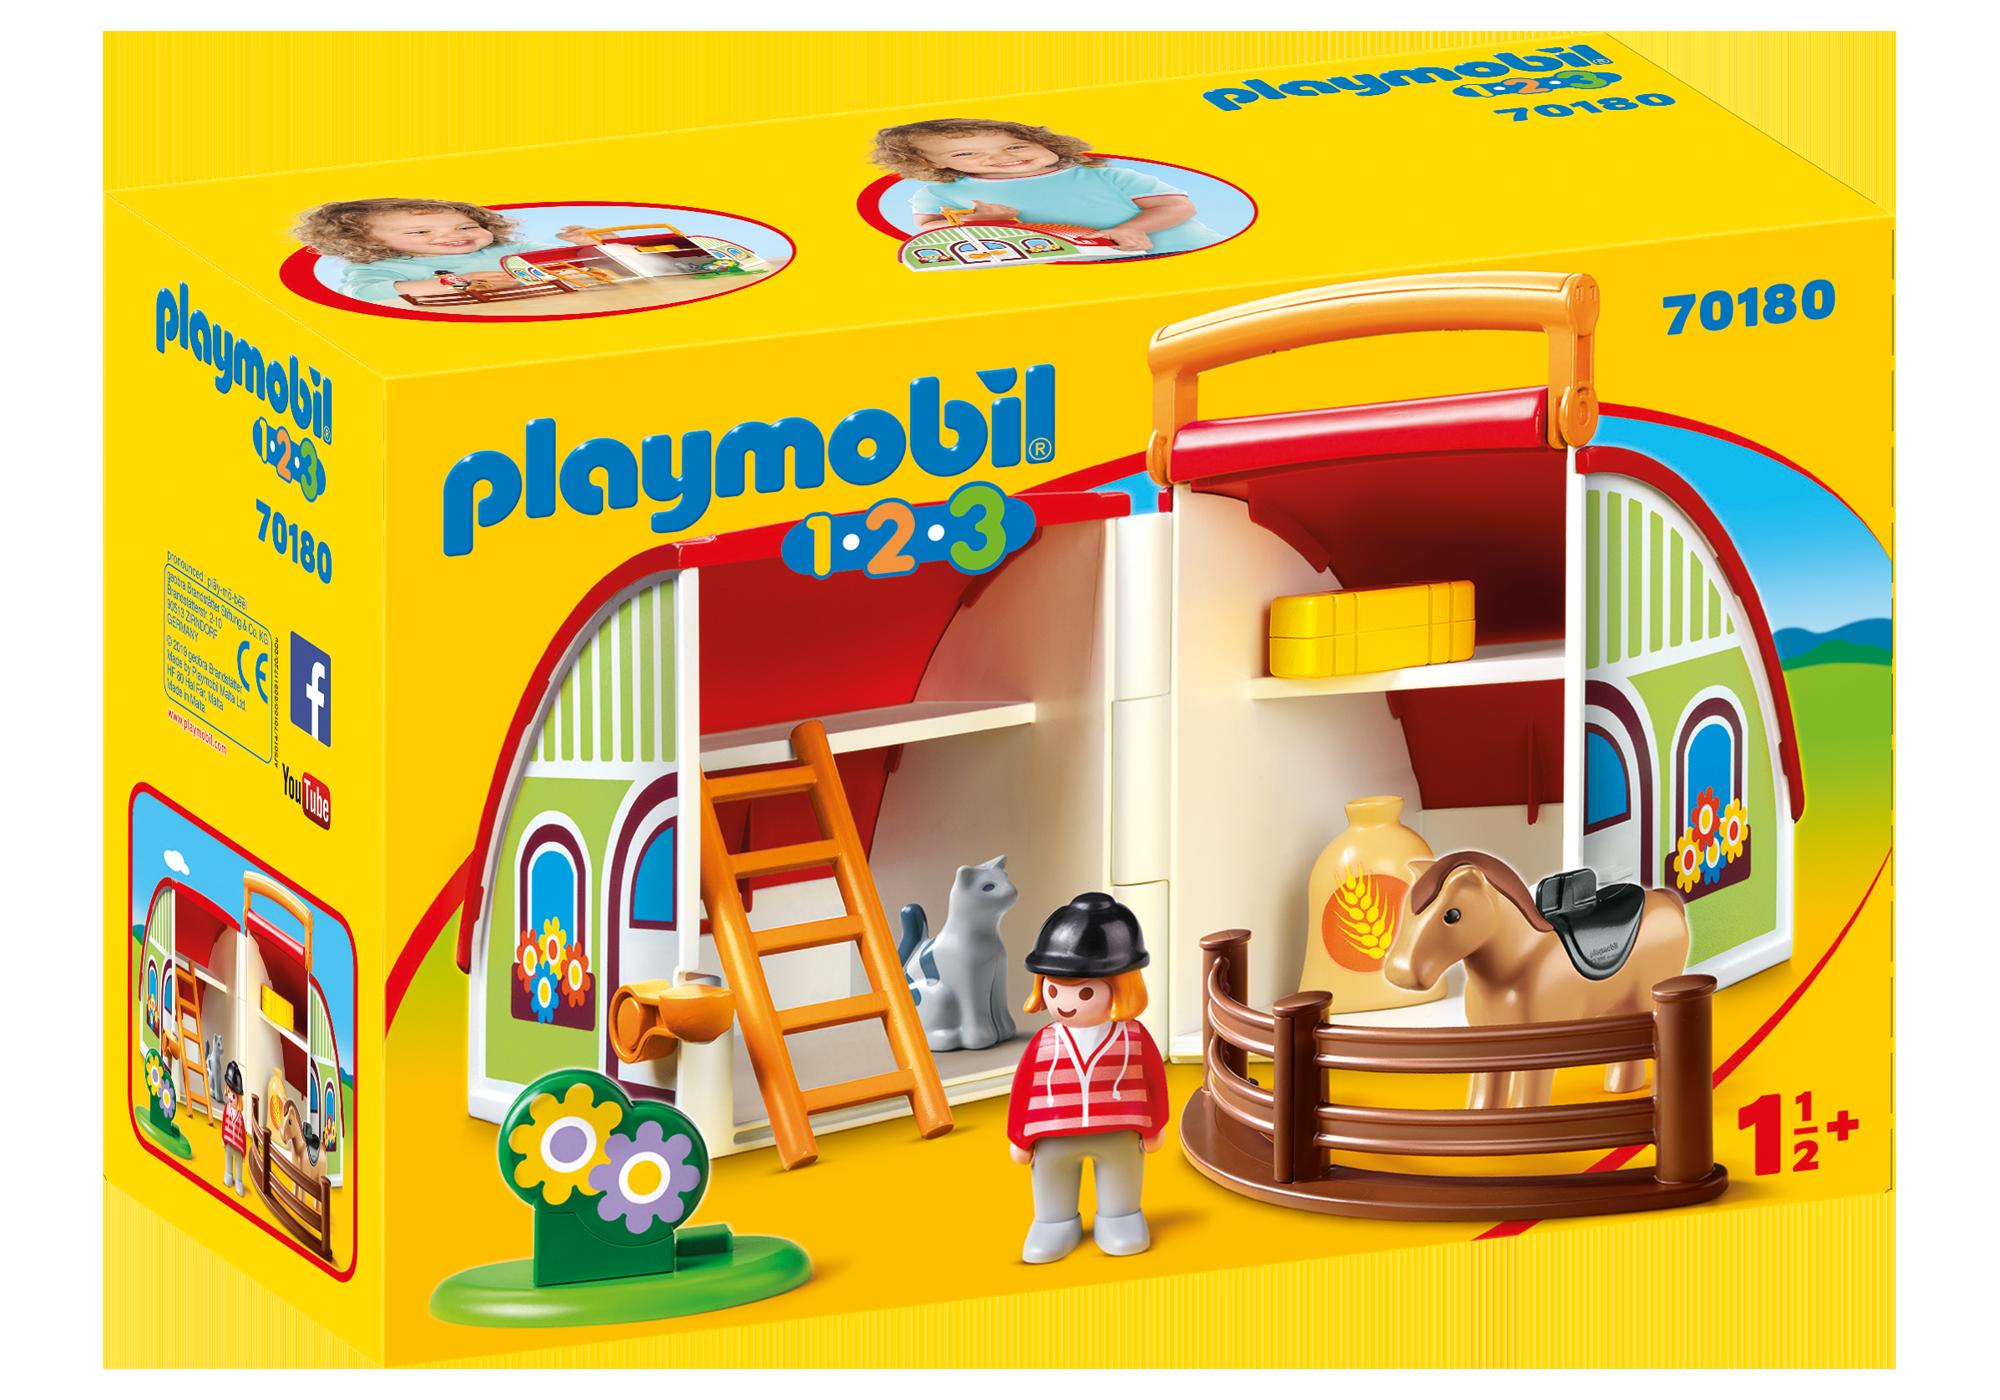 http://media.playmobil.com/i/playmobil/70180_product_box_front/Fattoria portatile 1.2.3